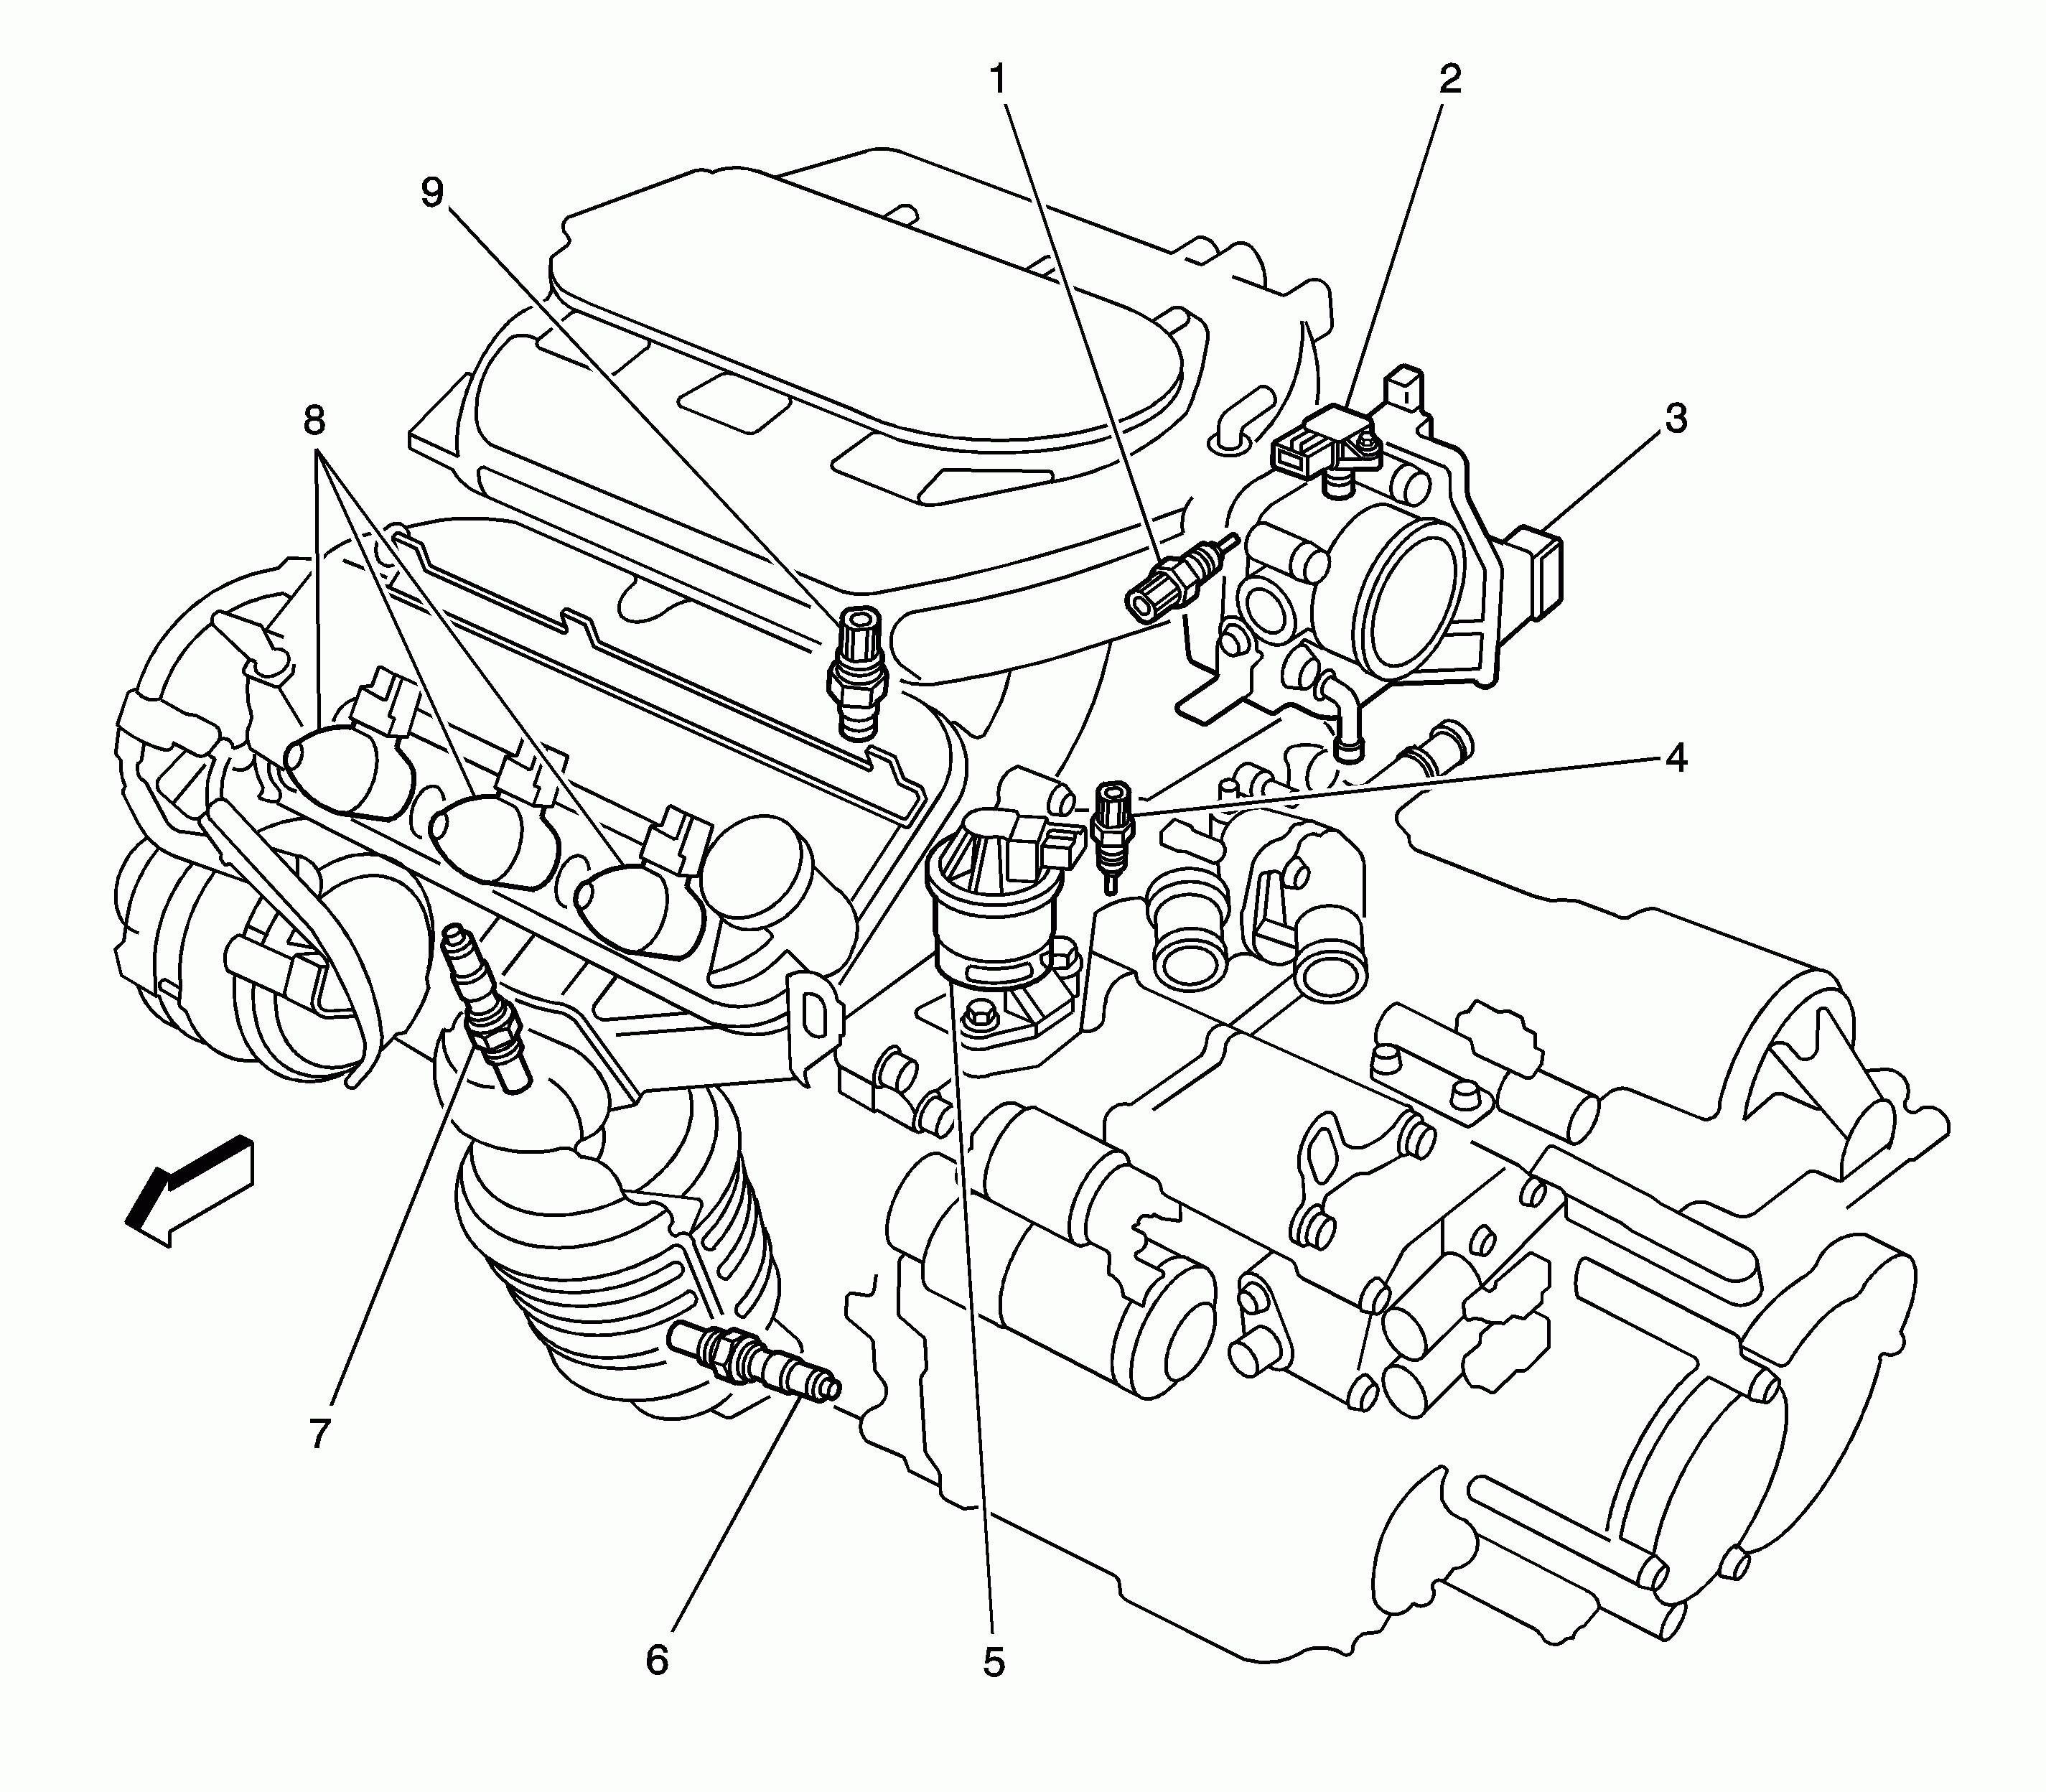 [SCHEMATICS_4UK]  🏆 [DIAGRAM in Pictures Database] 2000 Pontiac Bonneville Engine Diagrams  Just Download or Read Engine Diagrams - CONTRASTS.ONYXUM.COM | 2002 Grand Am Engine Diagram |  | Onyxum.com